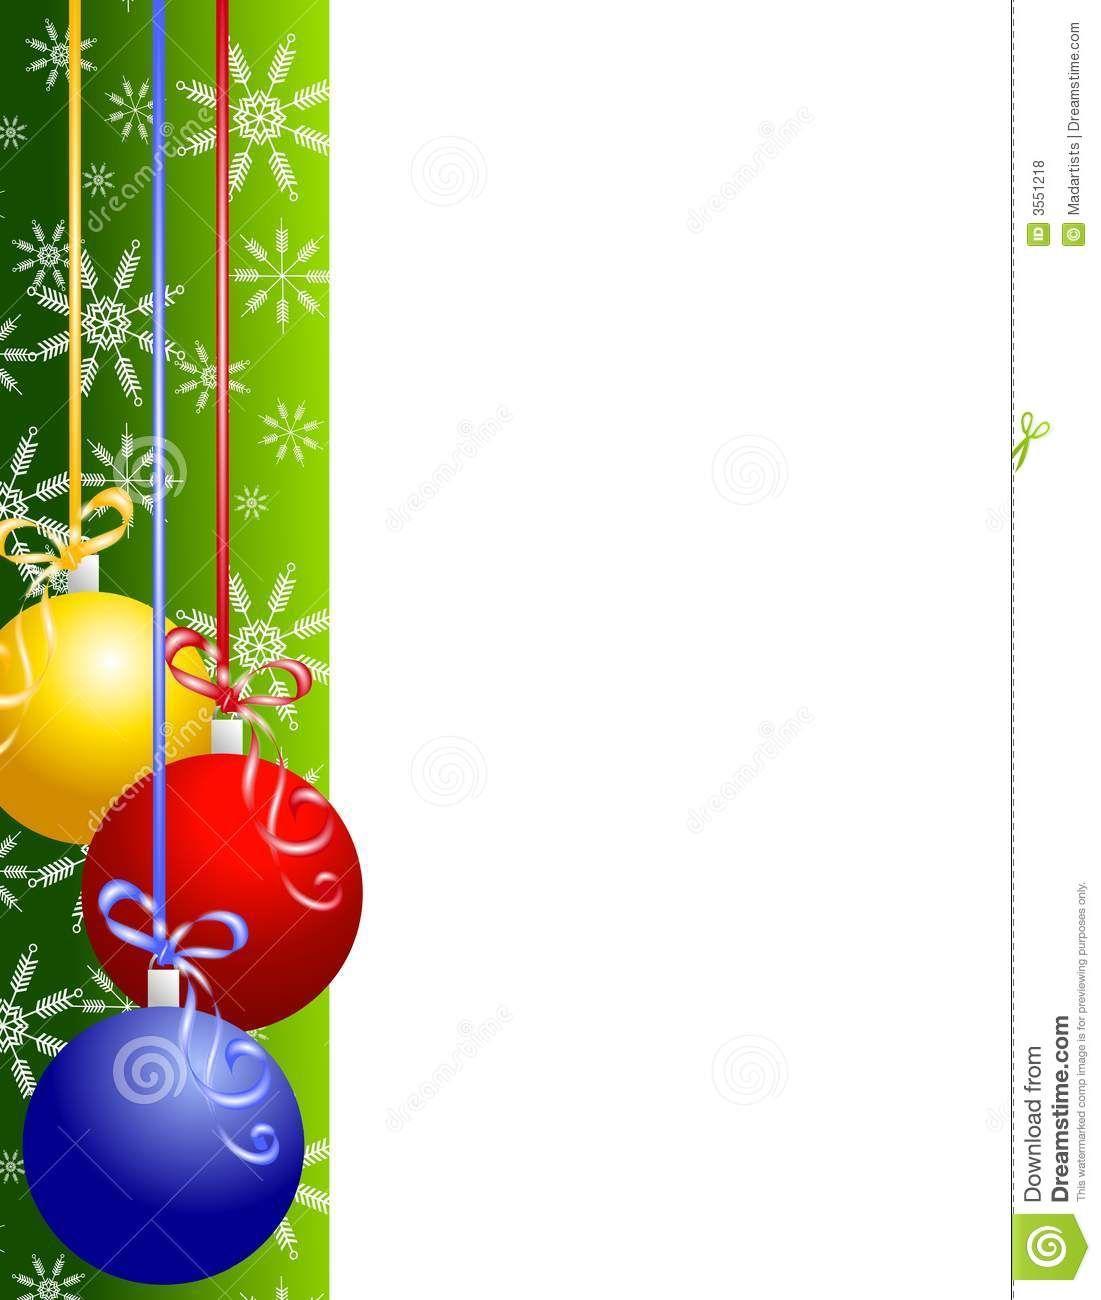 christmas clipart borders christmas ornaments border 3551218 jpg rh pinterest co uk christmas clip art border images christmas clip art border images